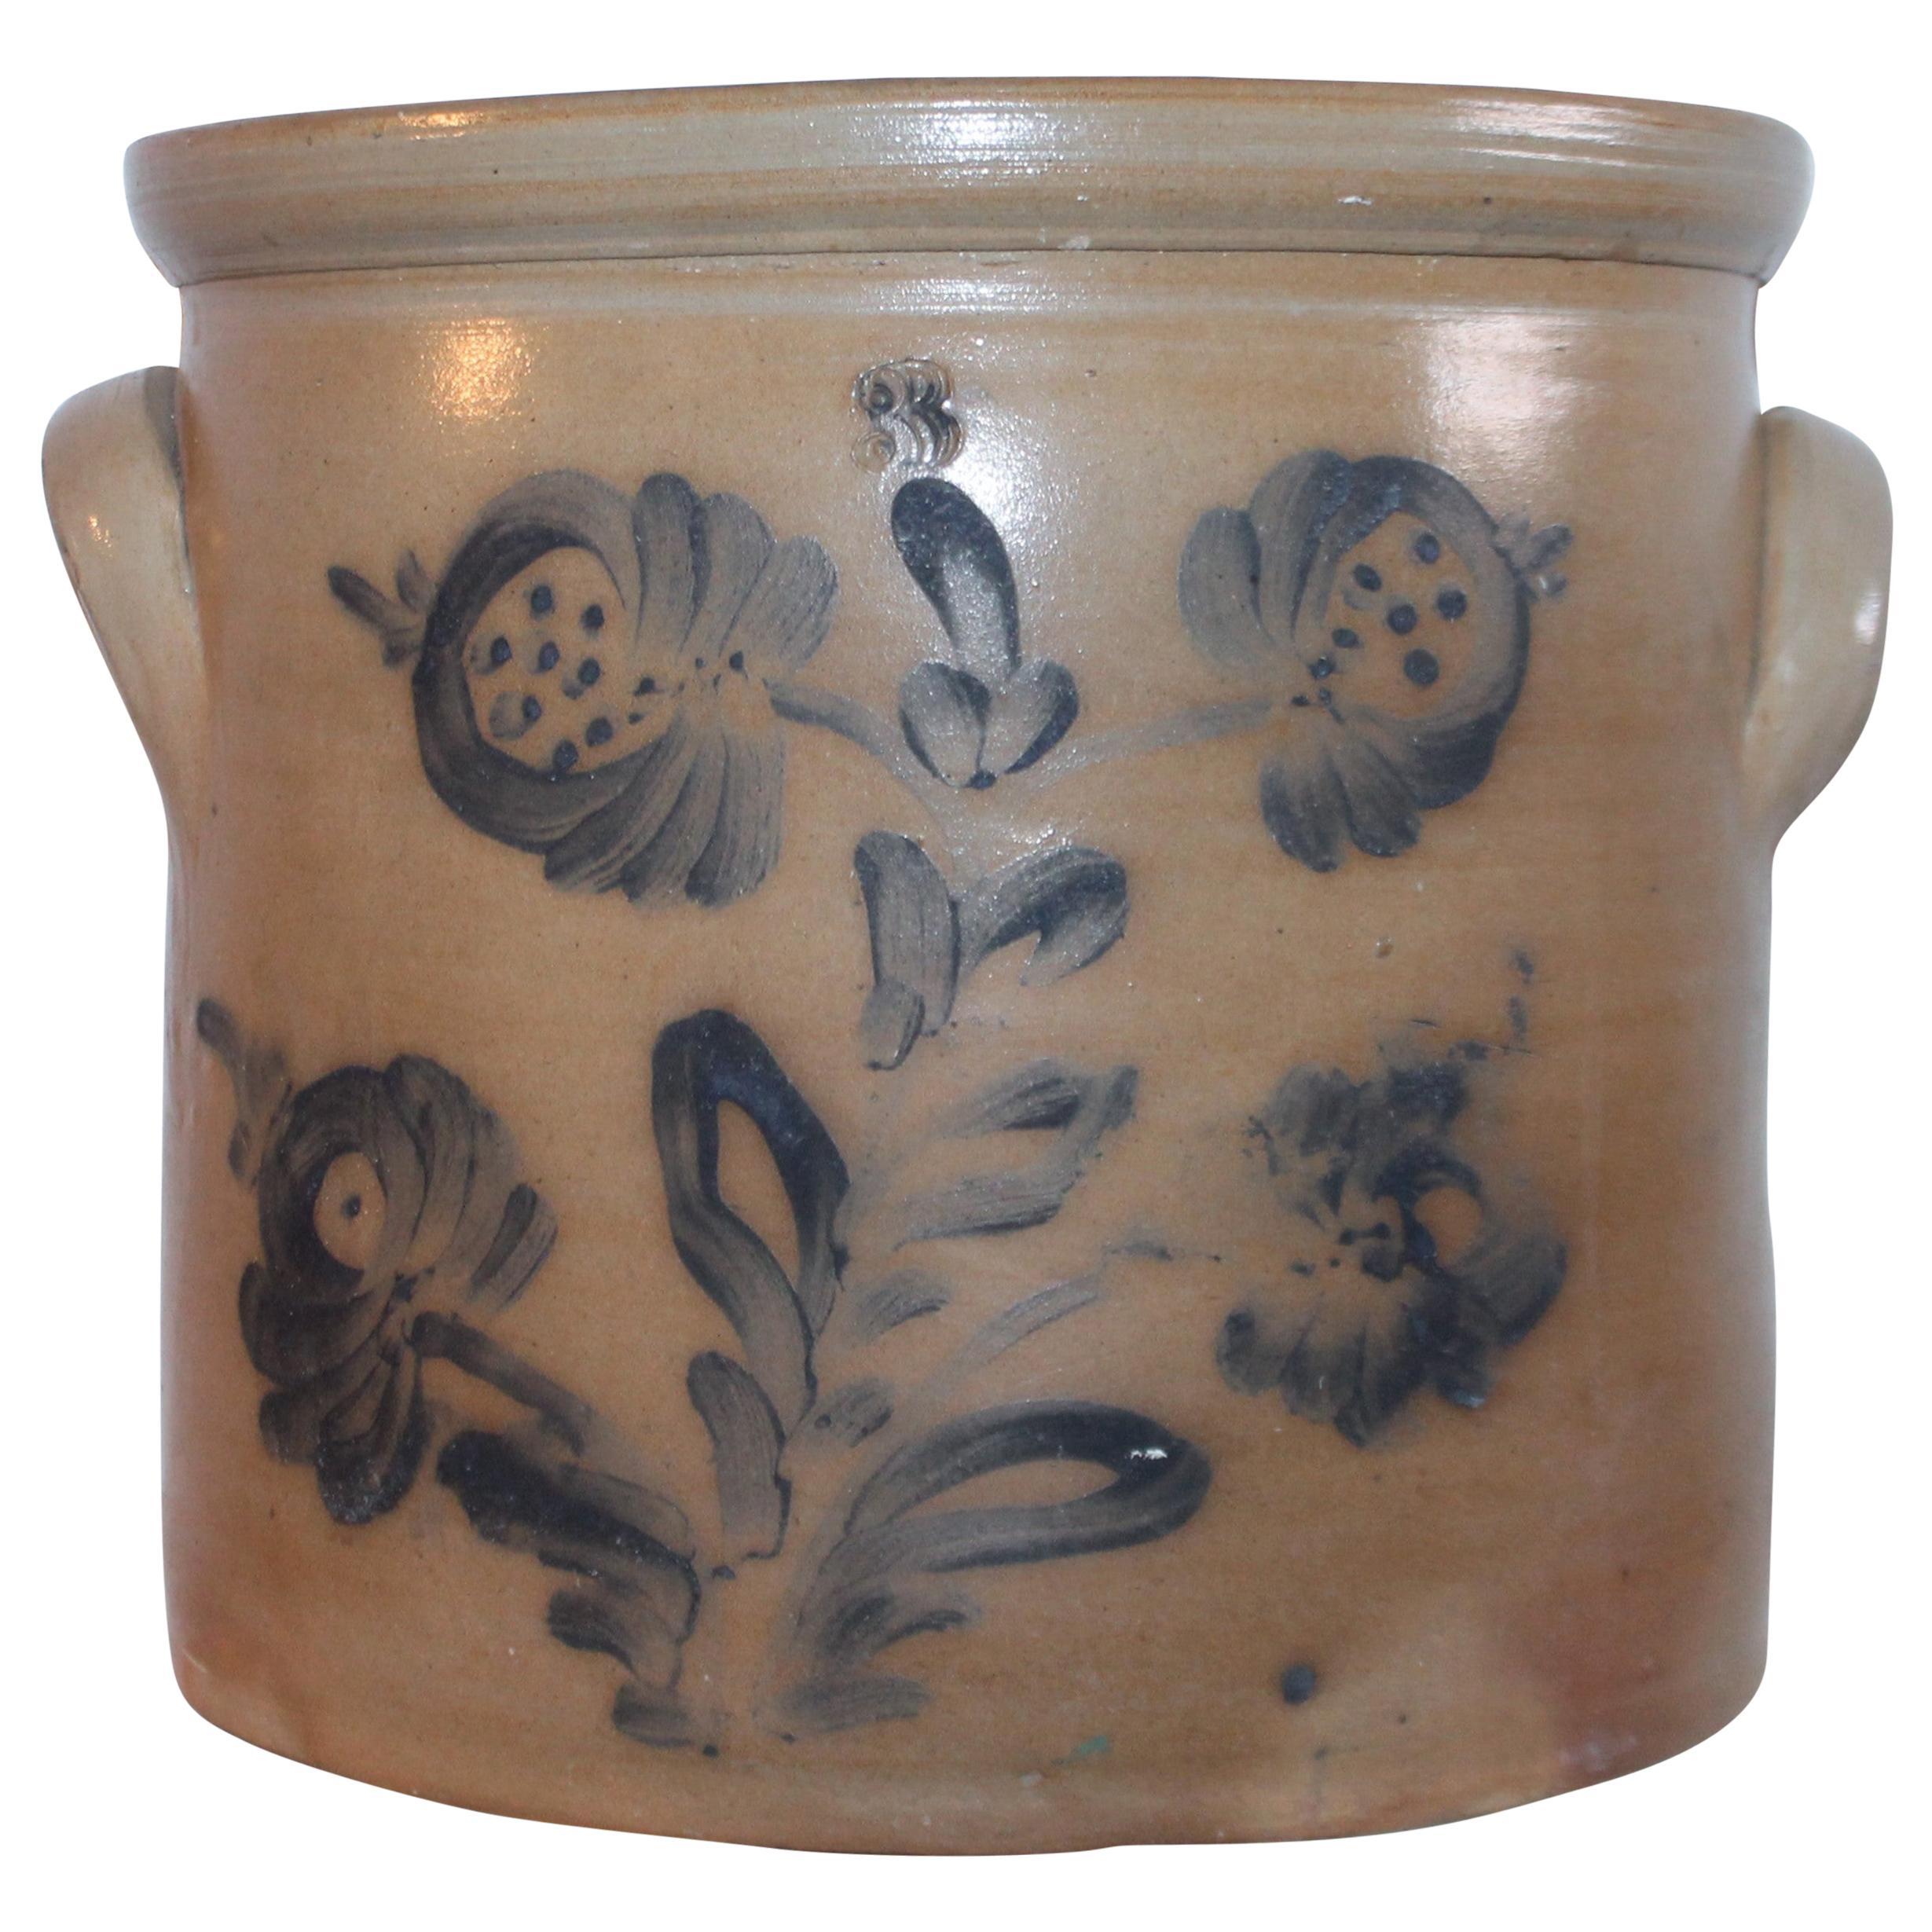 19th Century Decorated Stoneware Blue Decorated Crock